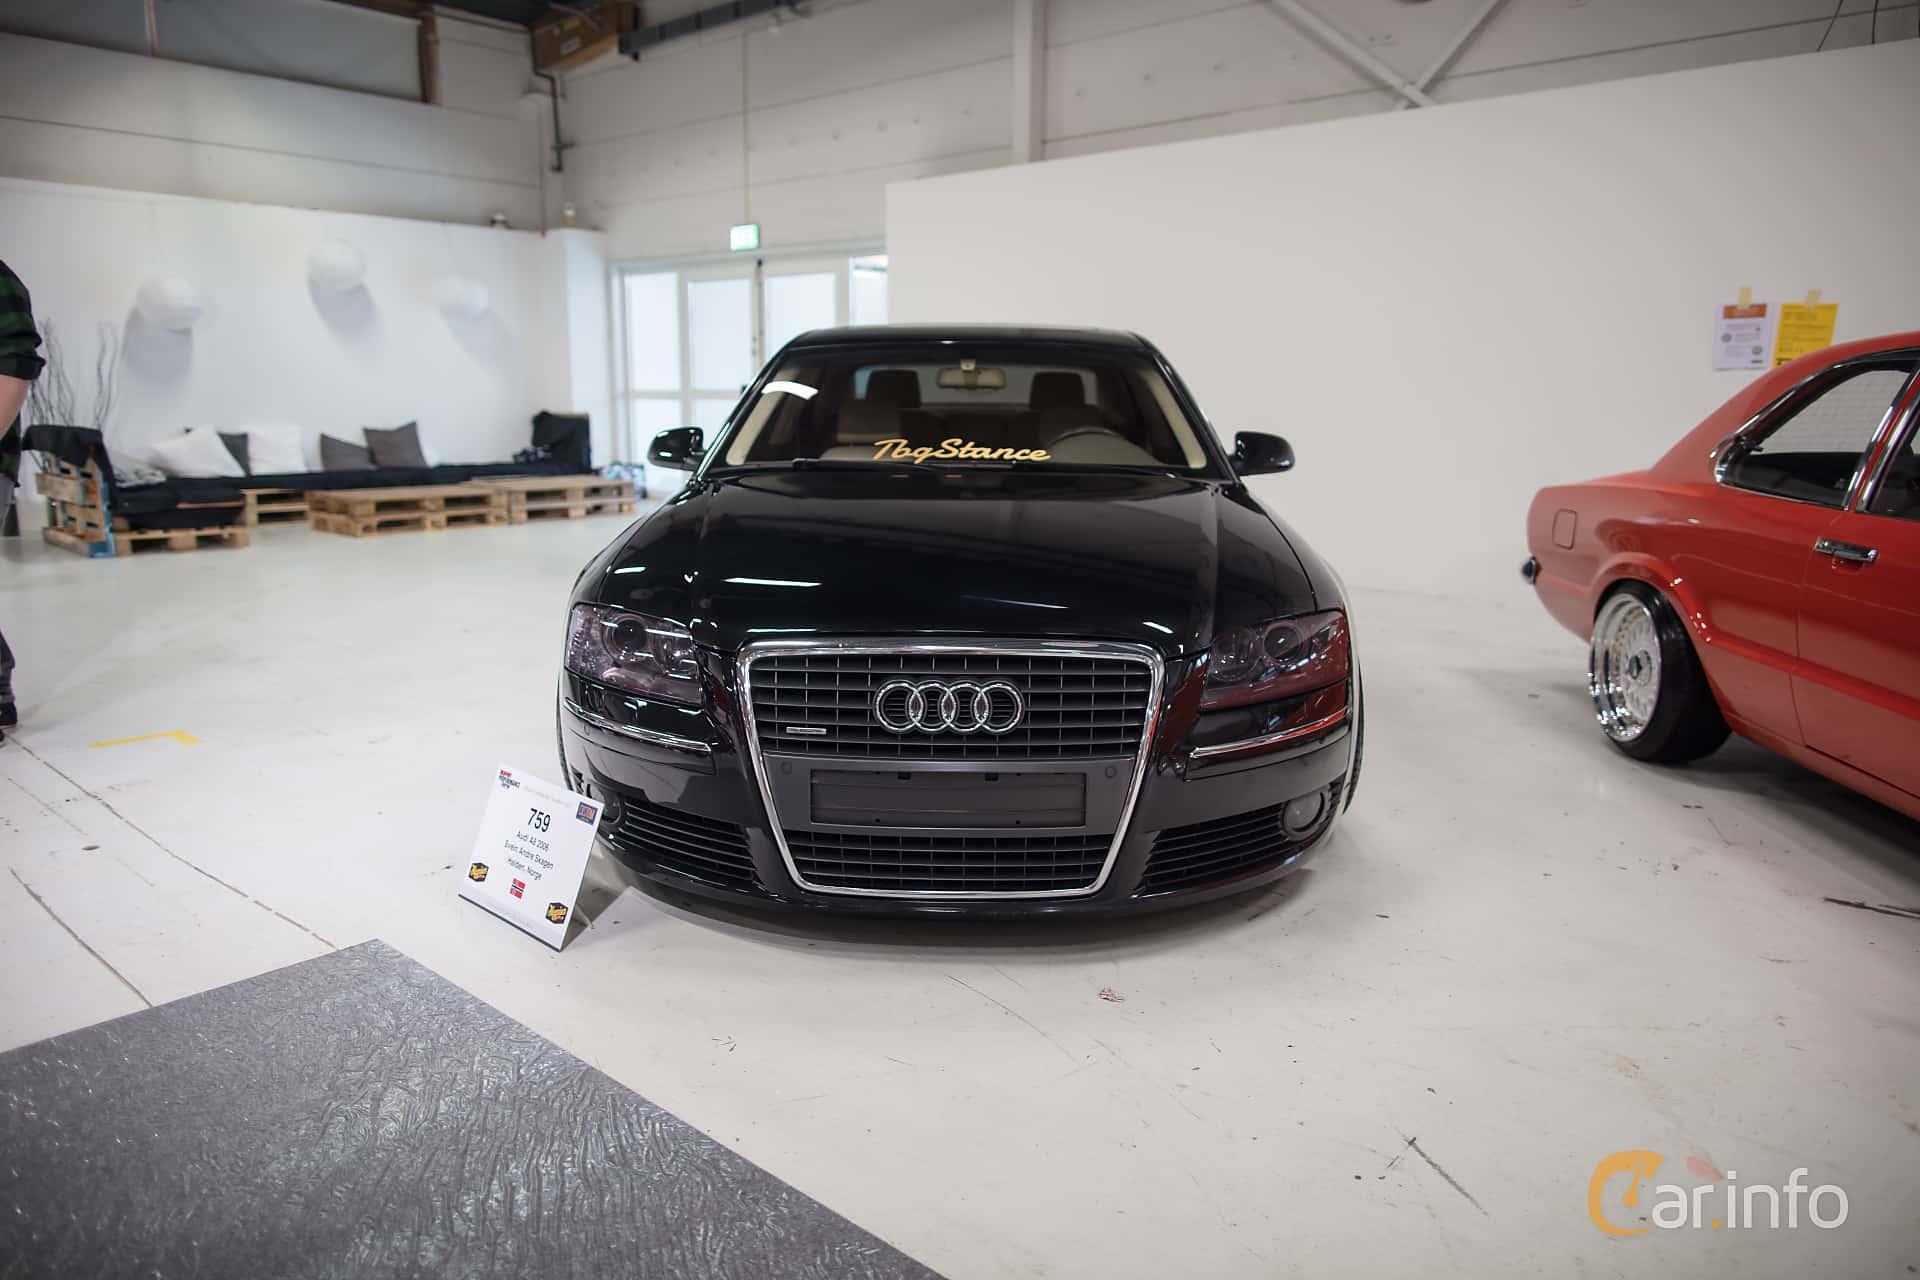 Audi A D Facelift - Audi car owners database